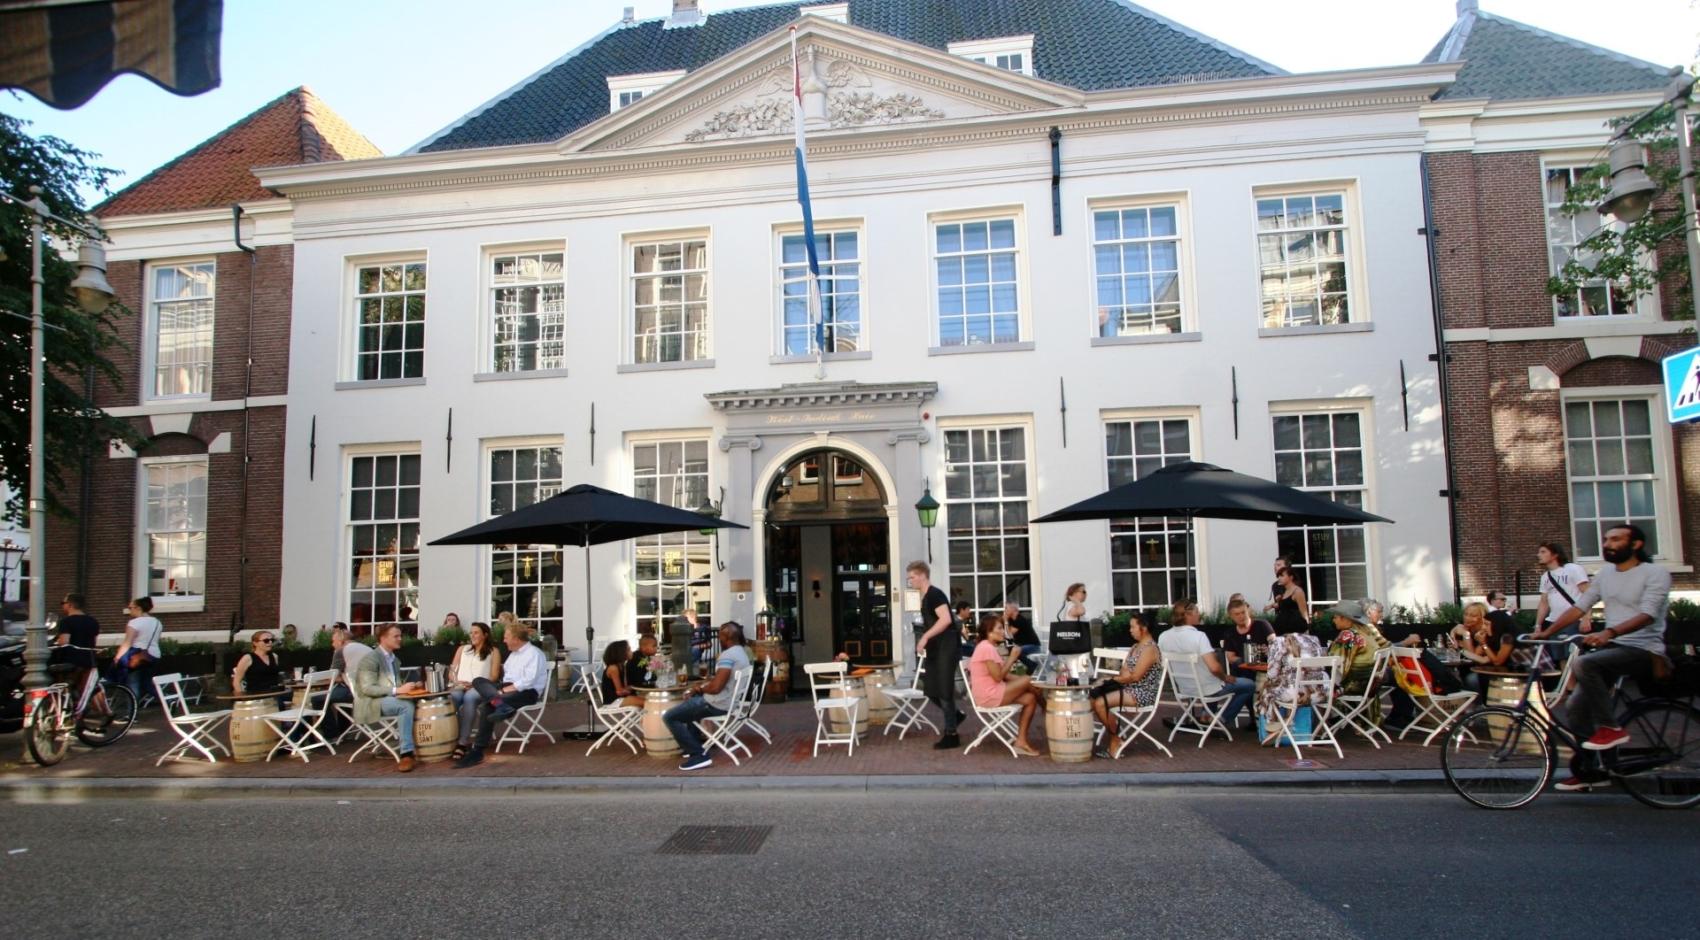 NieuwAmsterdam_WestIndischHuis